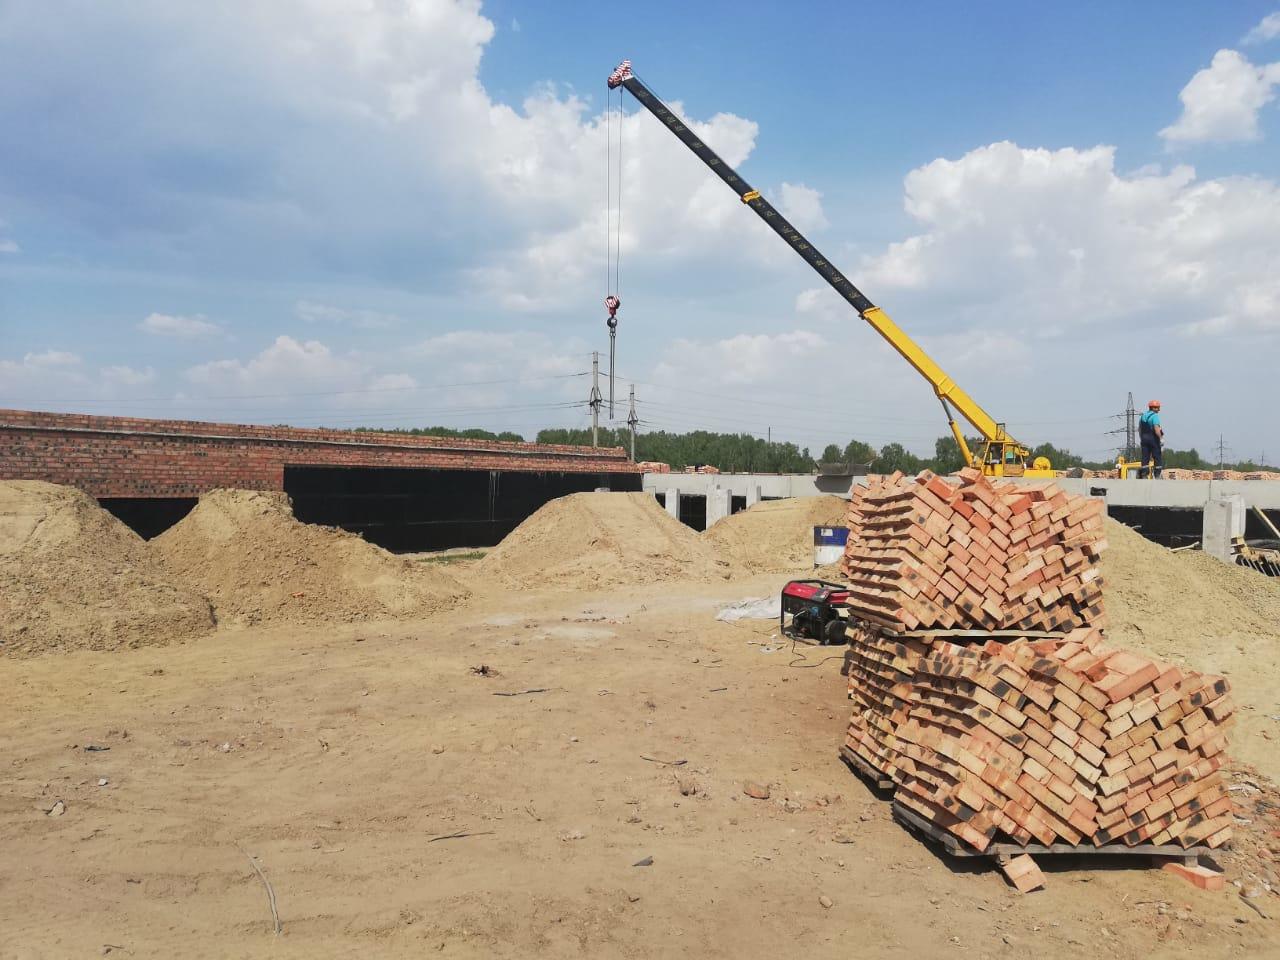 На окраине Омска строят сразу два садика #Новости #Общество #Омск